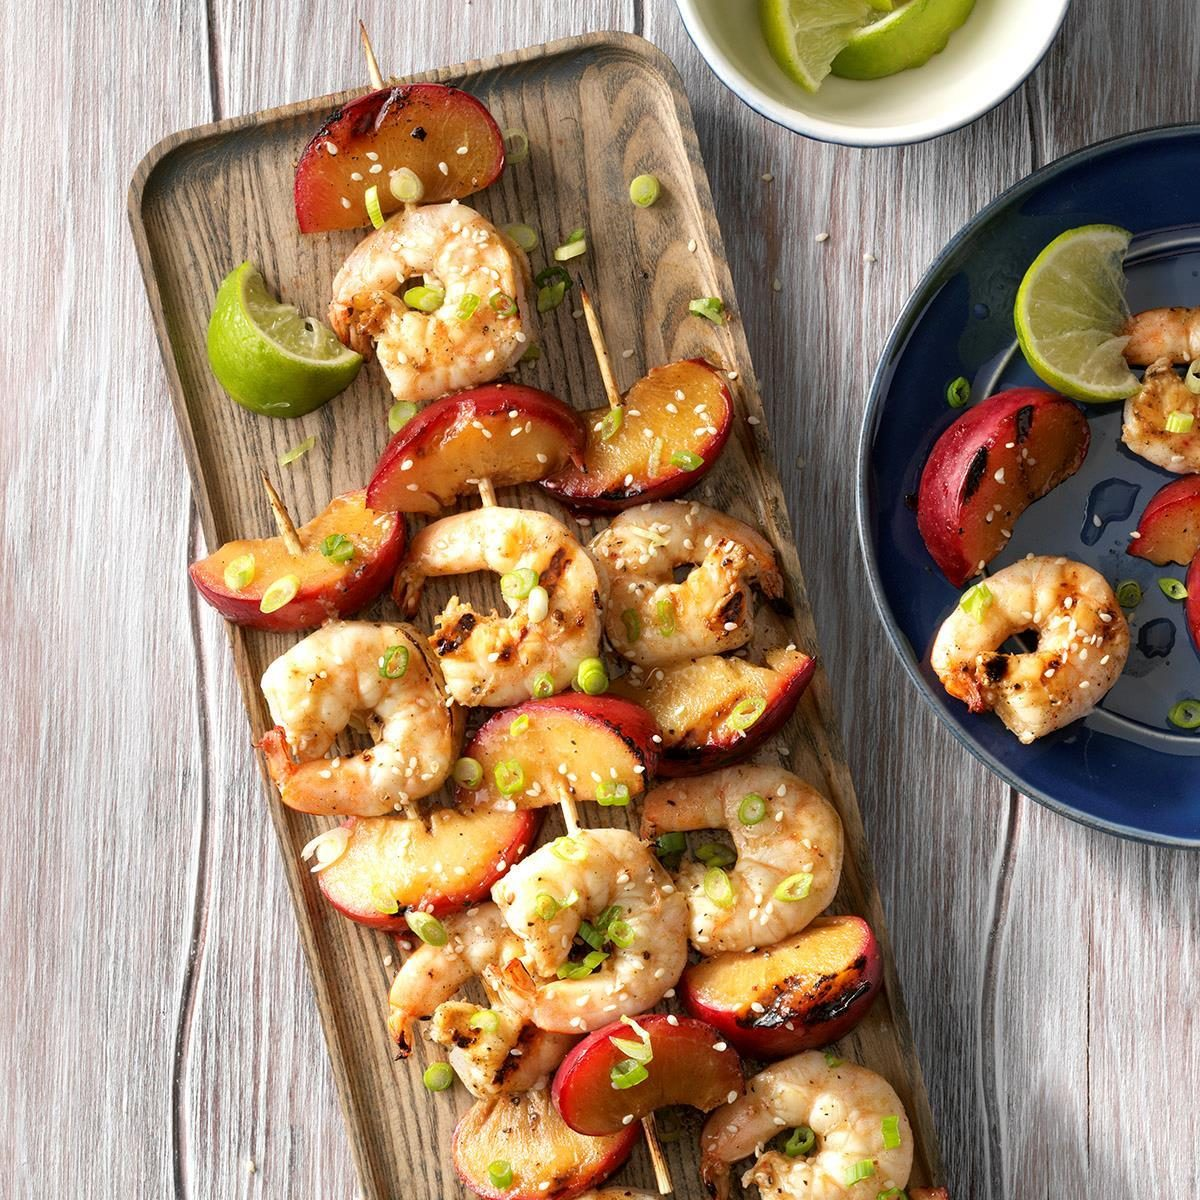 50 Easy Shrimp Recipes For Weeknight Dinners Taste Of Home